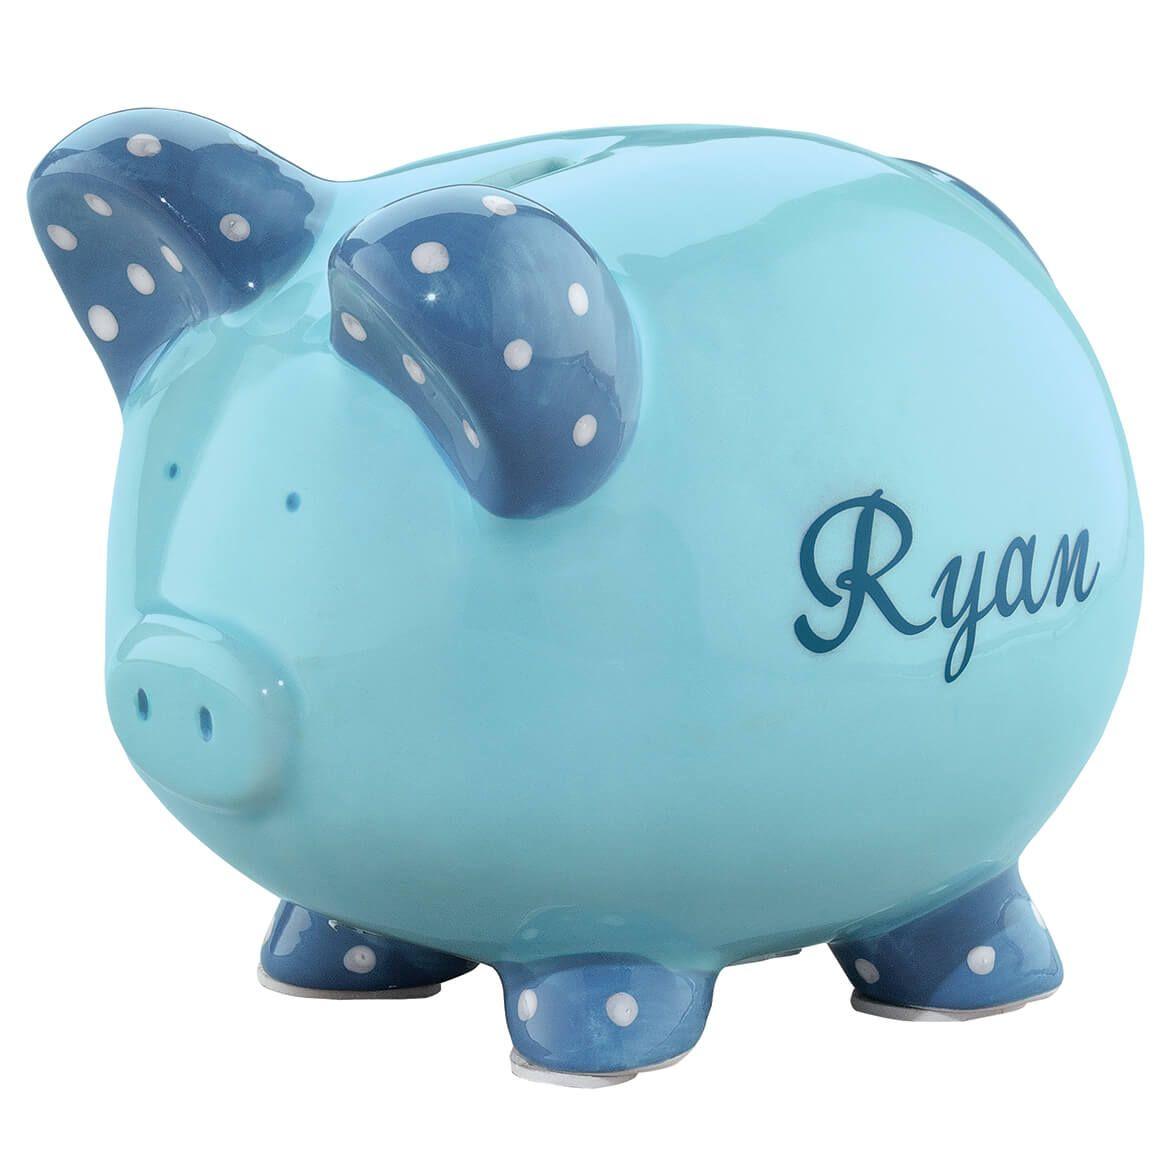 Personalized Children's Piggy Bank-311070